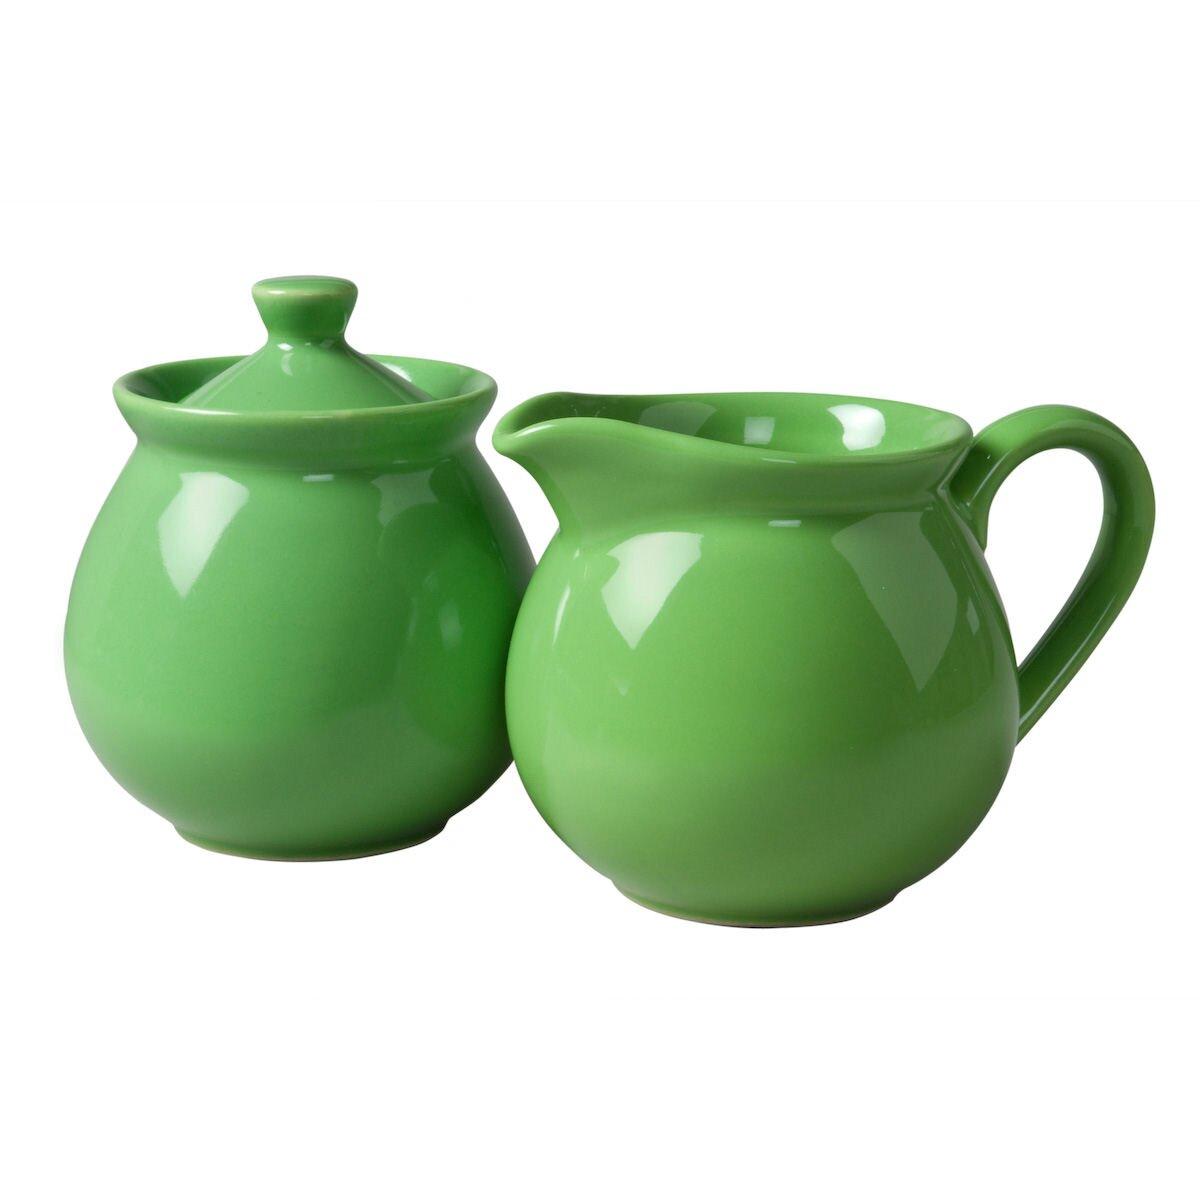 Yellow sugar bowls with lids - Fiesta Vine Yellow Sugar Bowl Original Fiestaware